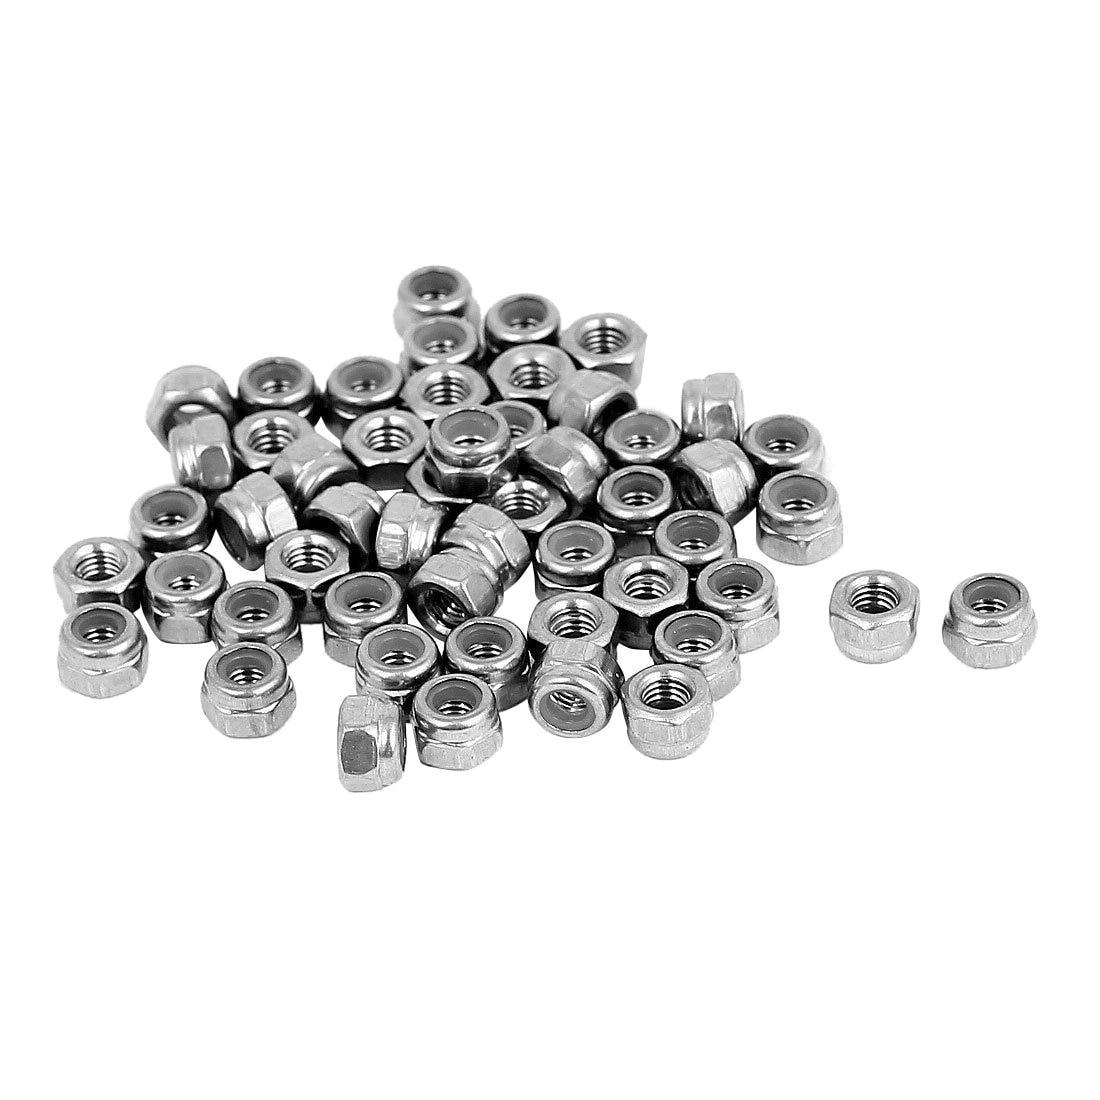 CNIM Hot M3 X 0.5mm Stainless Steel Nylock Nylon Insert Hex Lock Nuts 50pcs